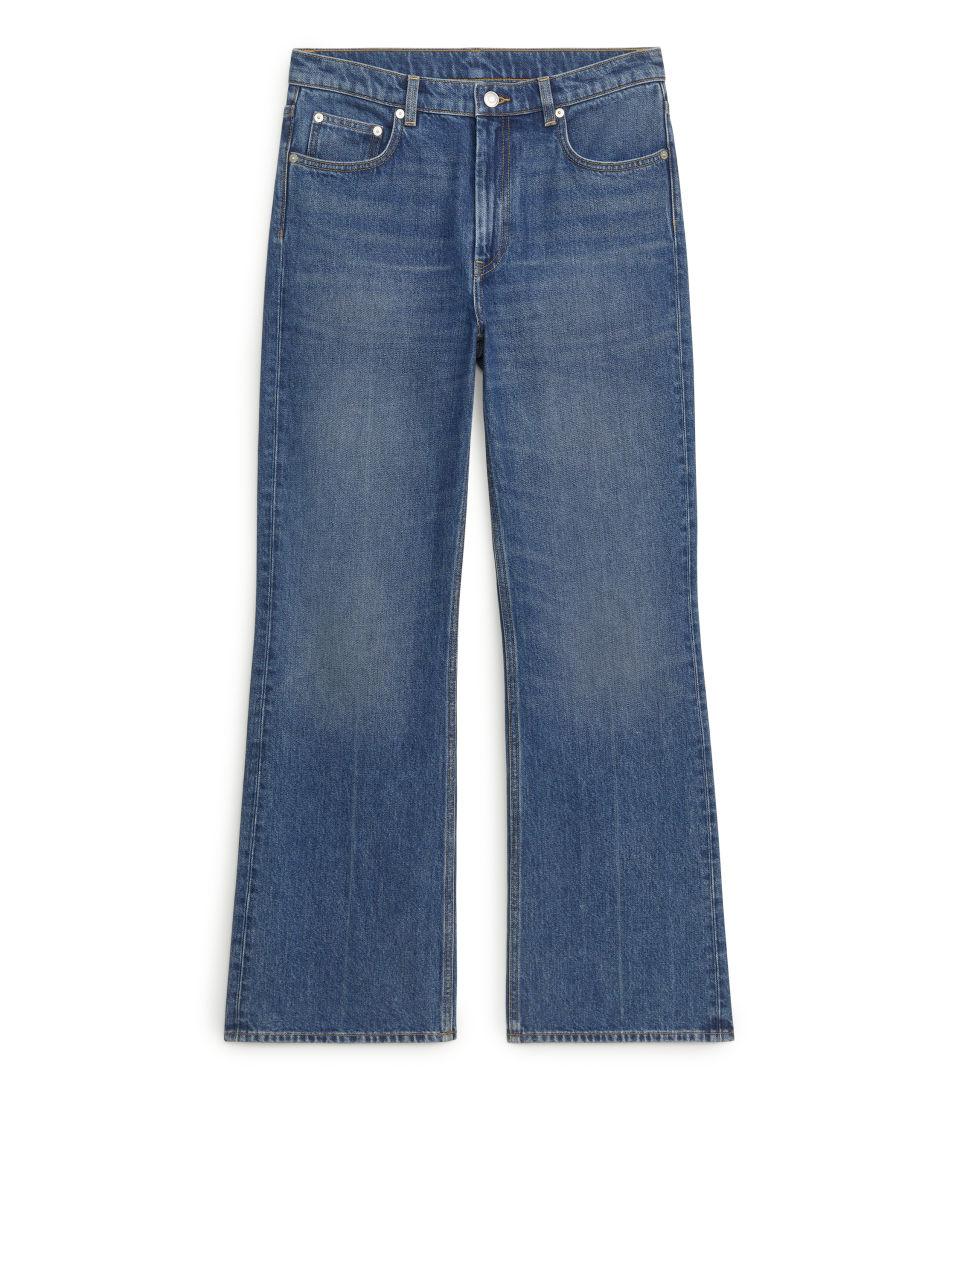 SLIM Flared Jeans - Blue